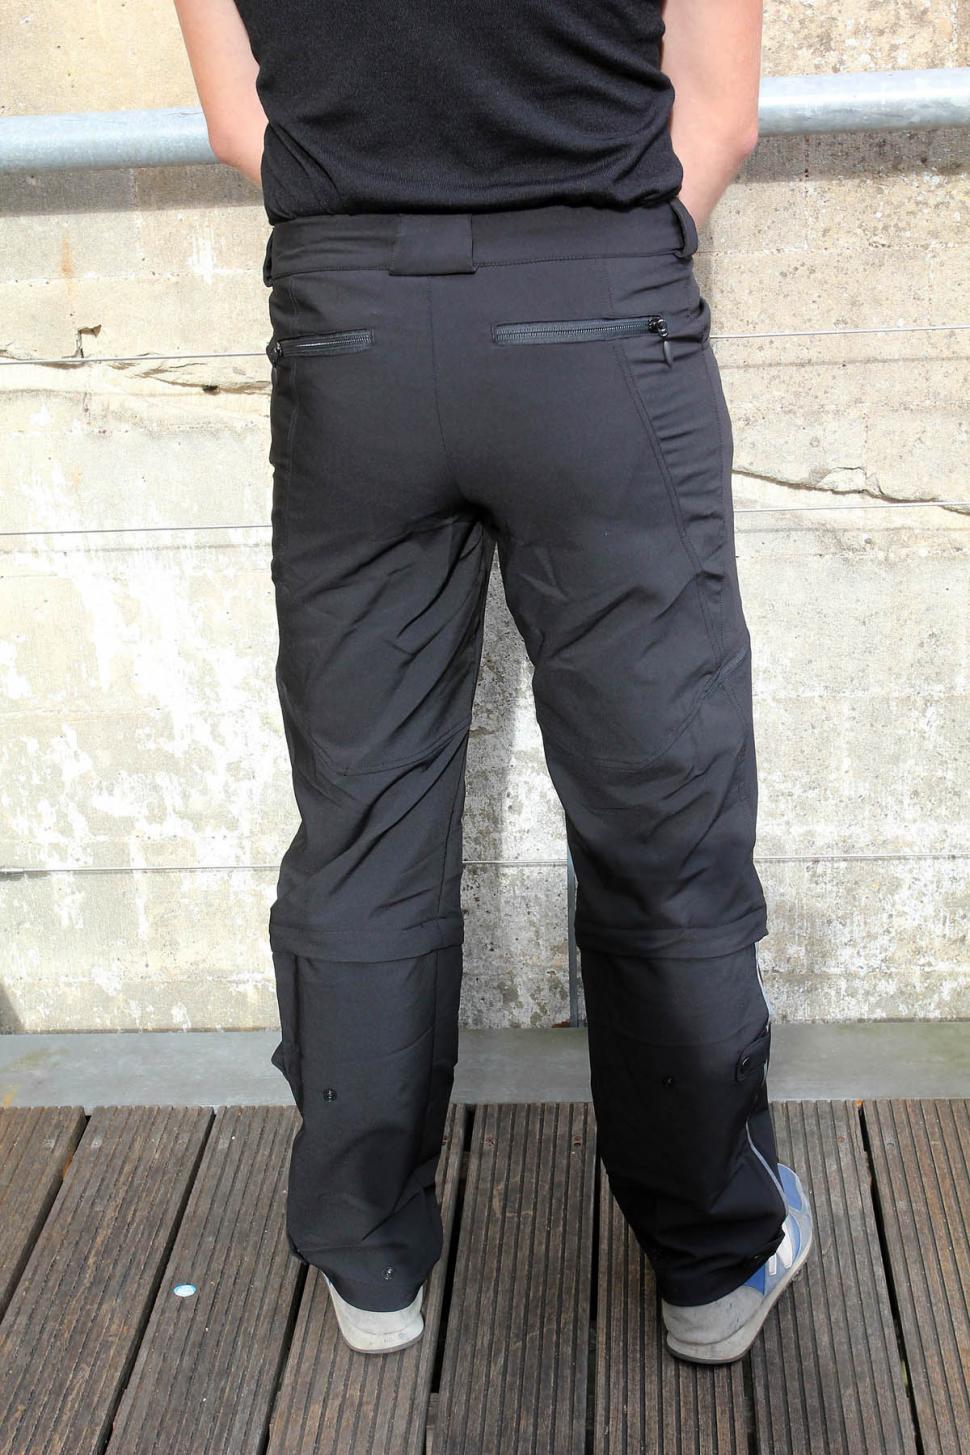 Showers Pass Hibrid Zip off pants rear